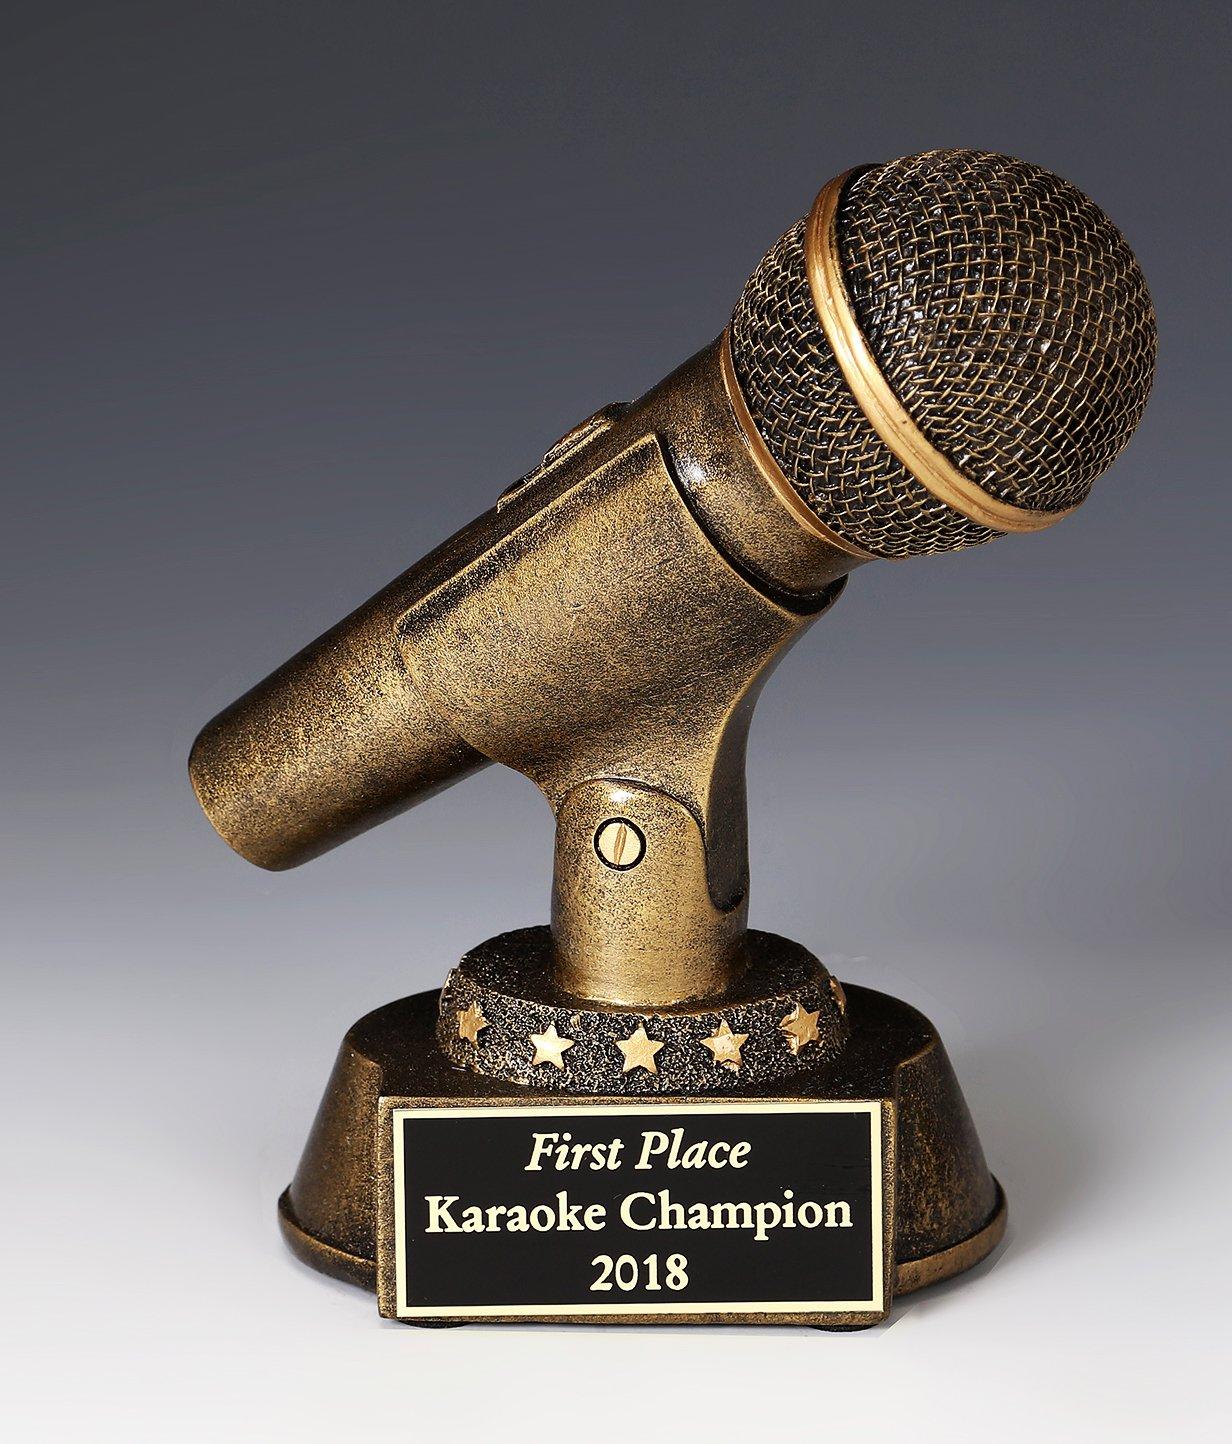 MICROPHONE, The GOLDEN MICROPHONE AWARD, SINGING, BROADCASTING NEWS, ANNOUNCER ETC. GOLDEN Resin Sculpture AWARD 6 1/2'''' TALL